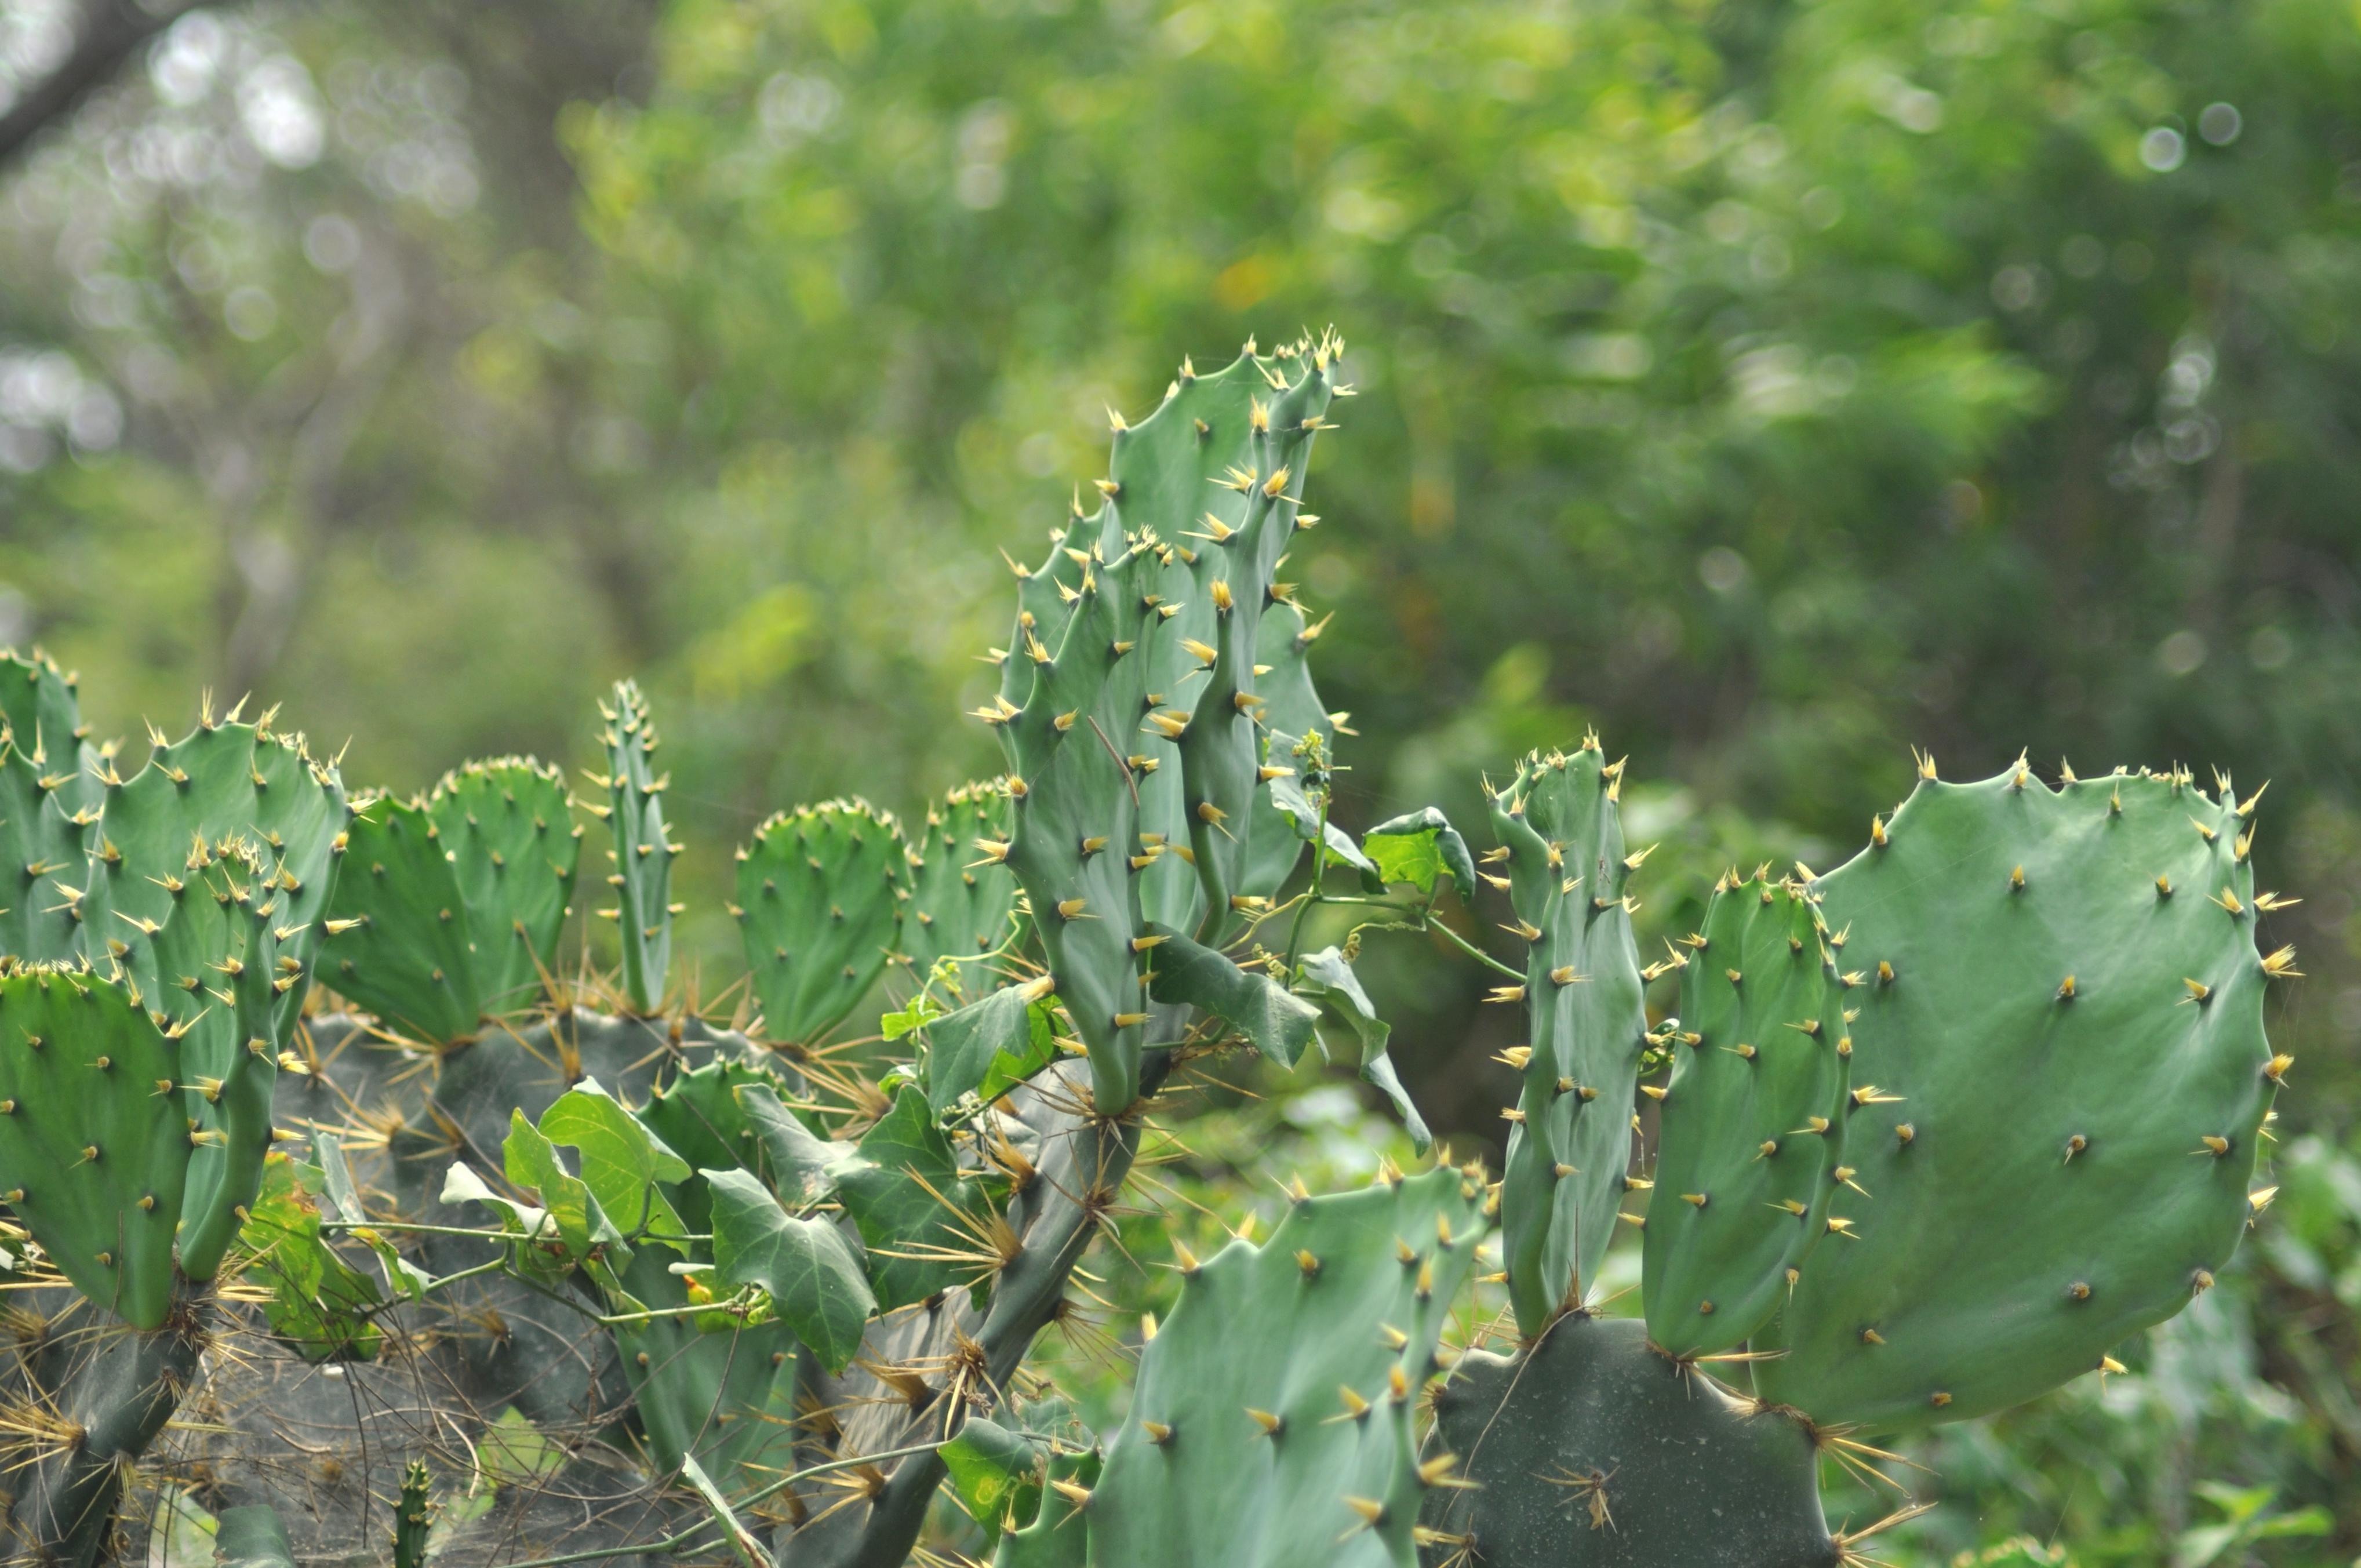 kostenlose bild kaktus pflanze gr n w ste kraut dorn. Black Bedroom Furniture Sets. Home Design Ideas